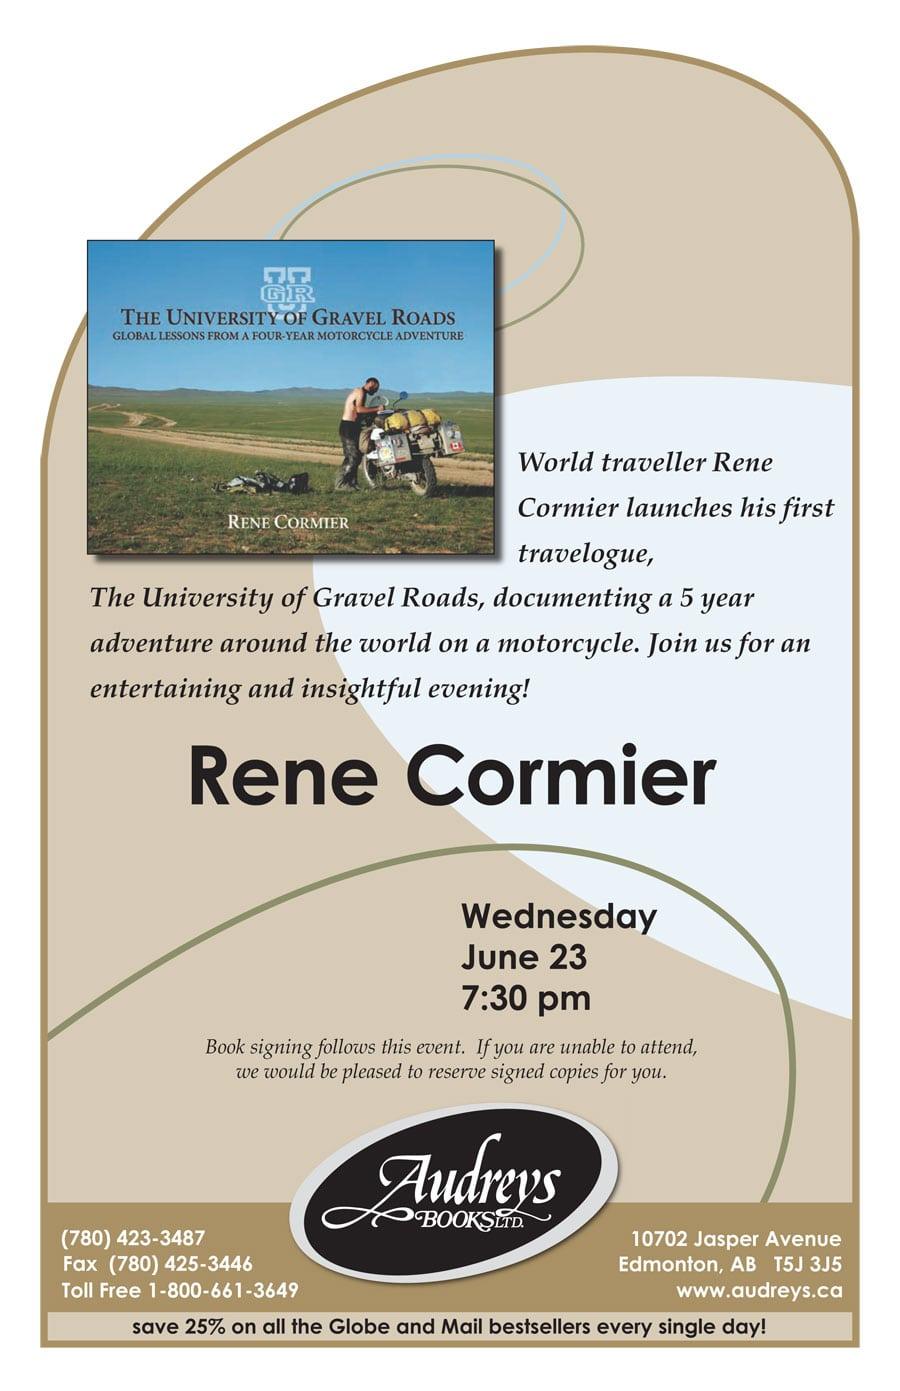 Slideshow and talk at Audrey's Books, Edmonton - Rene Cormier